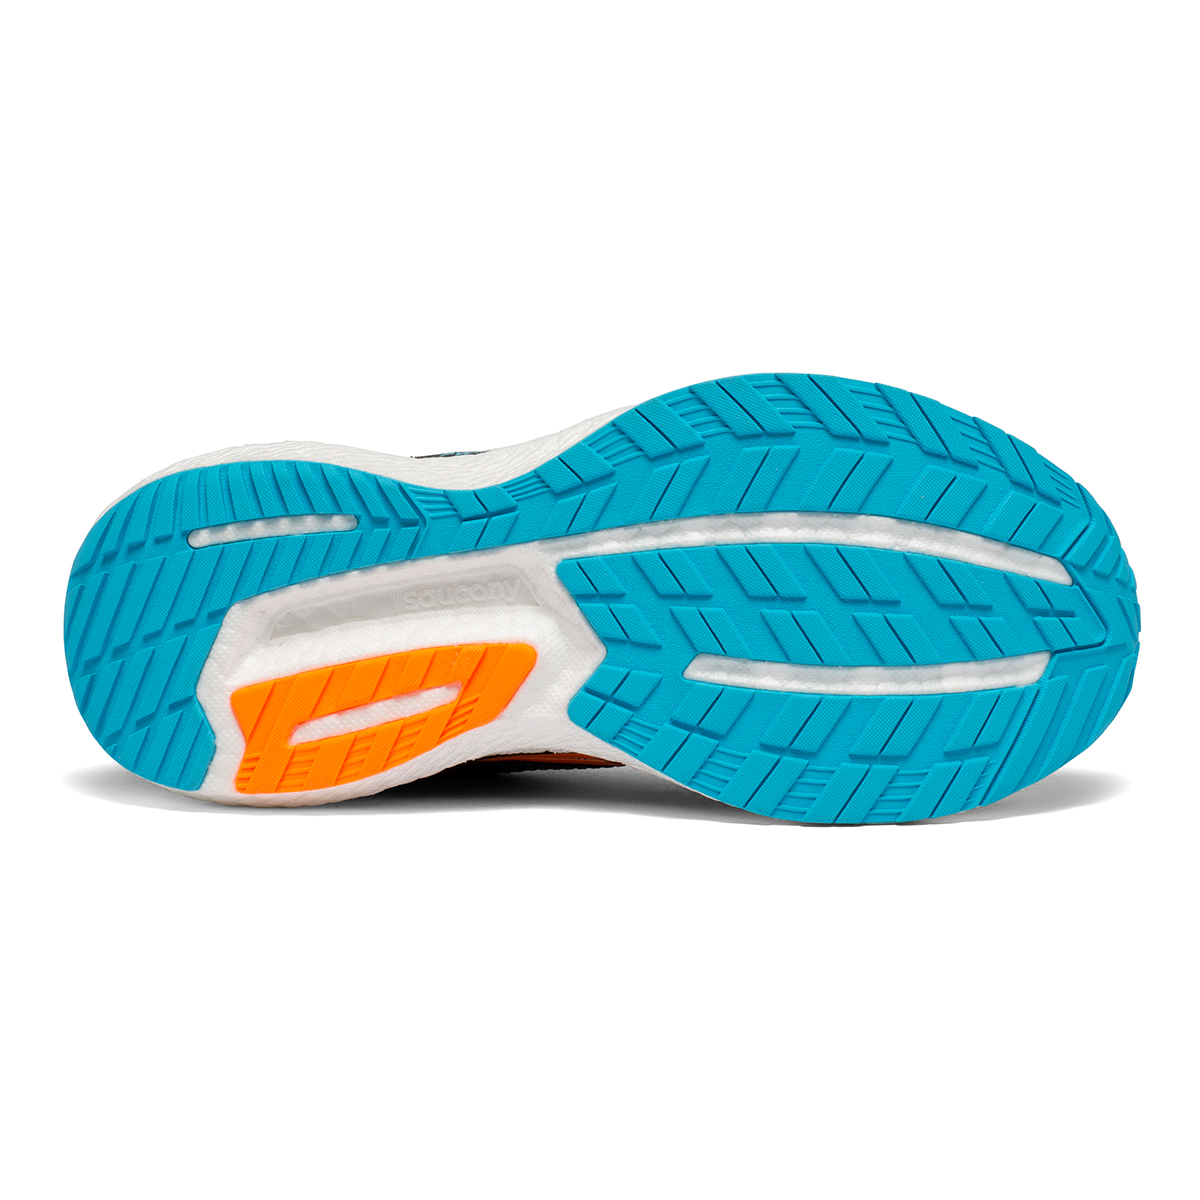 Women's Saucony Triumph 18 Running Shoe - Color: Future/Black - Size: 5 - Width: Regular, Future/Black, large, image 4